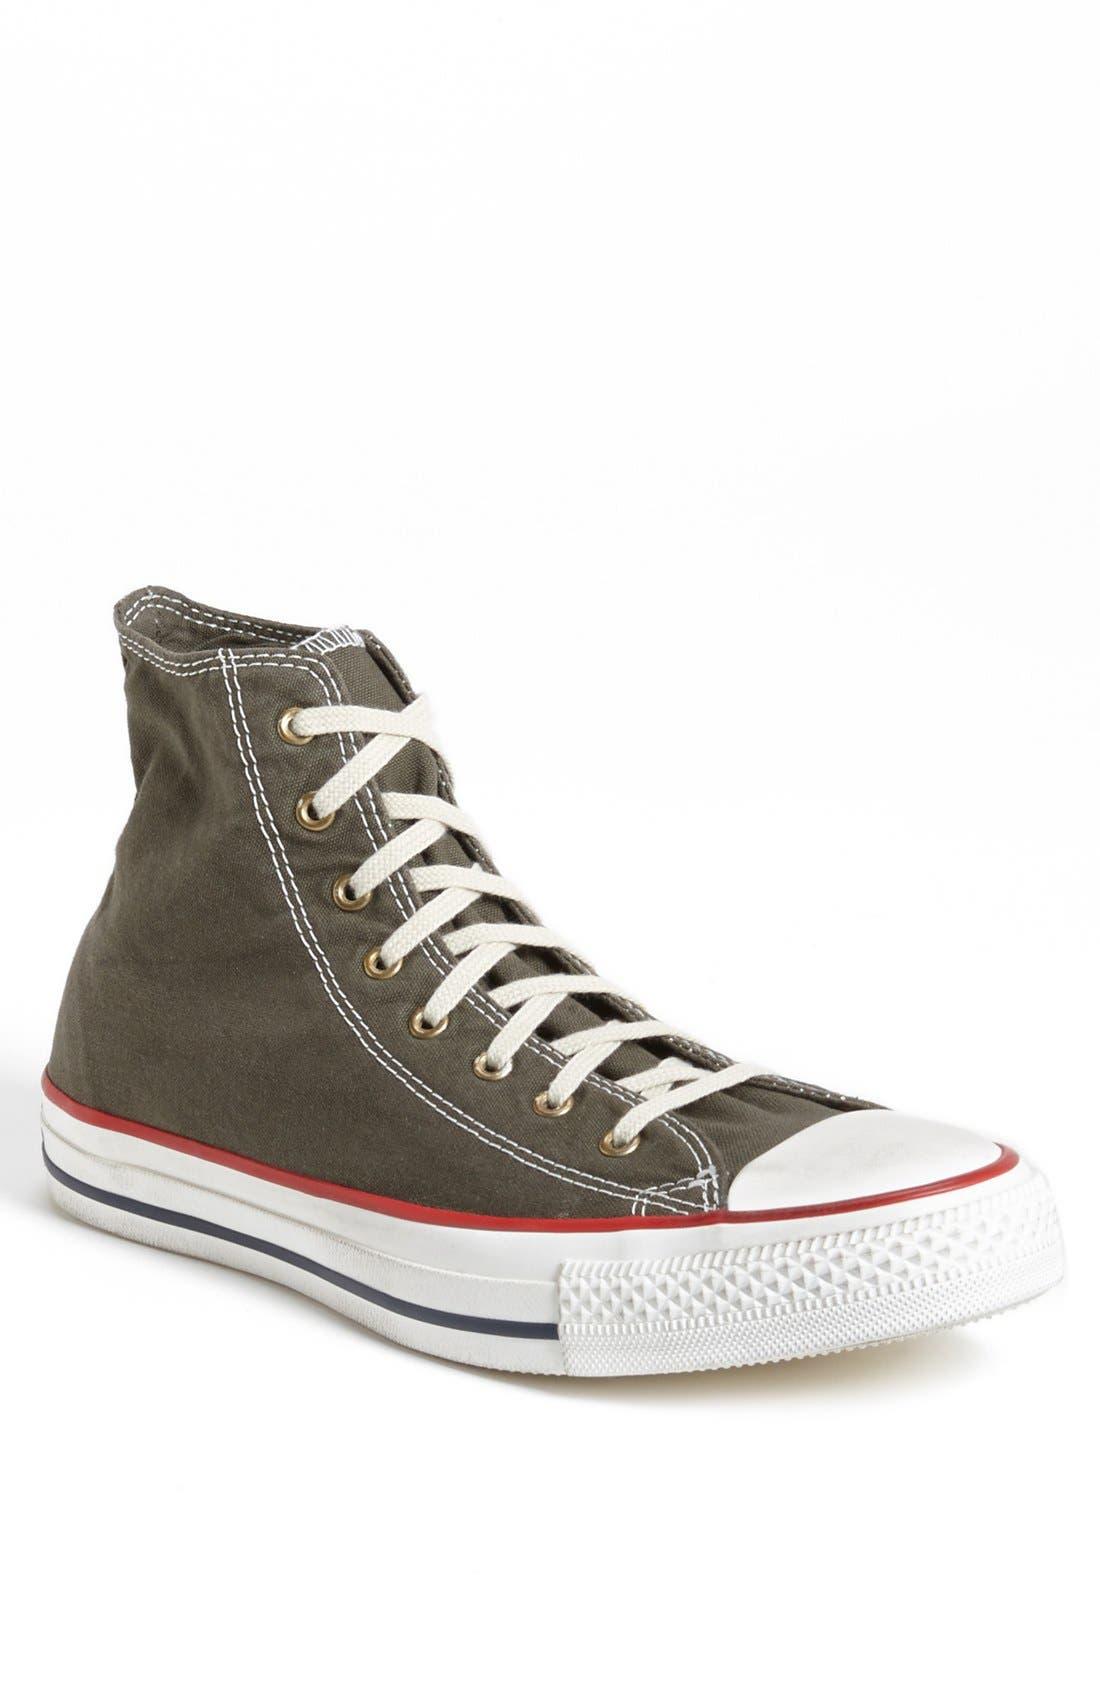 Alternate Image 1 Selected - Converse Chuck Taylor® All Star® Sneaker (Men)